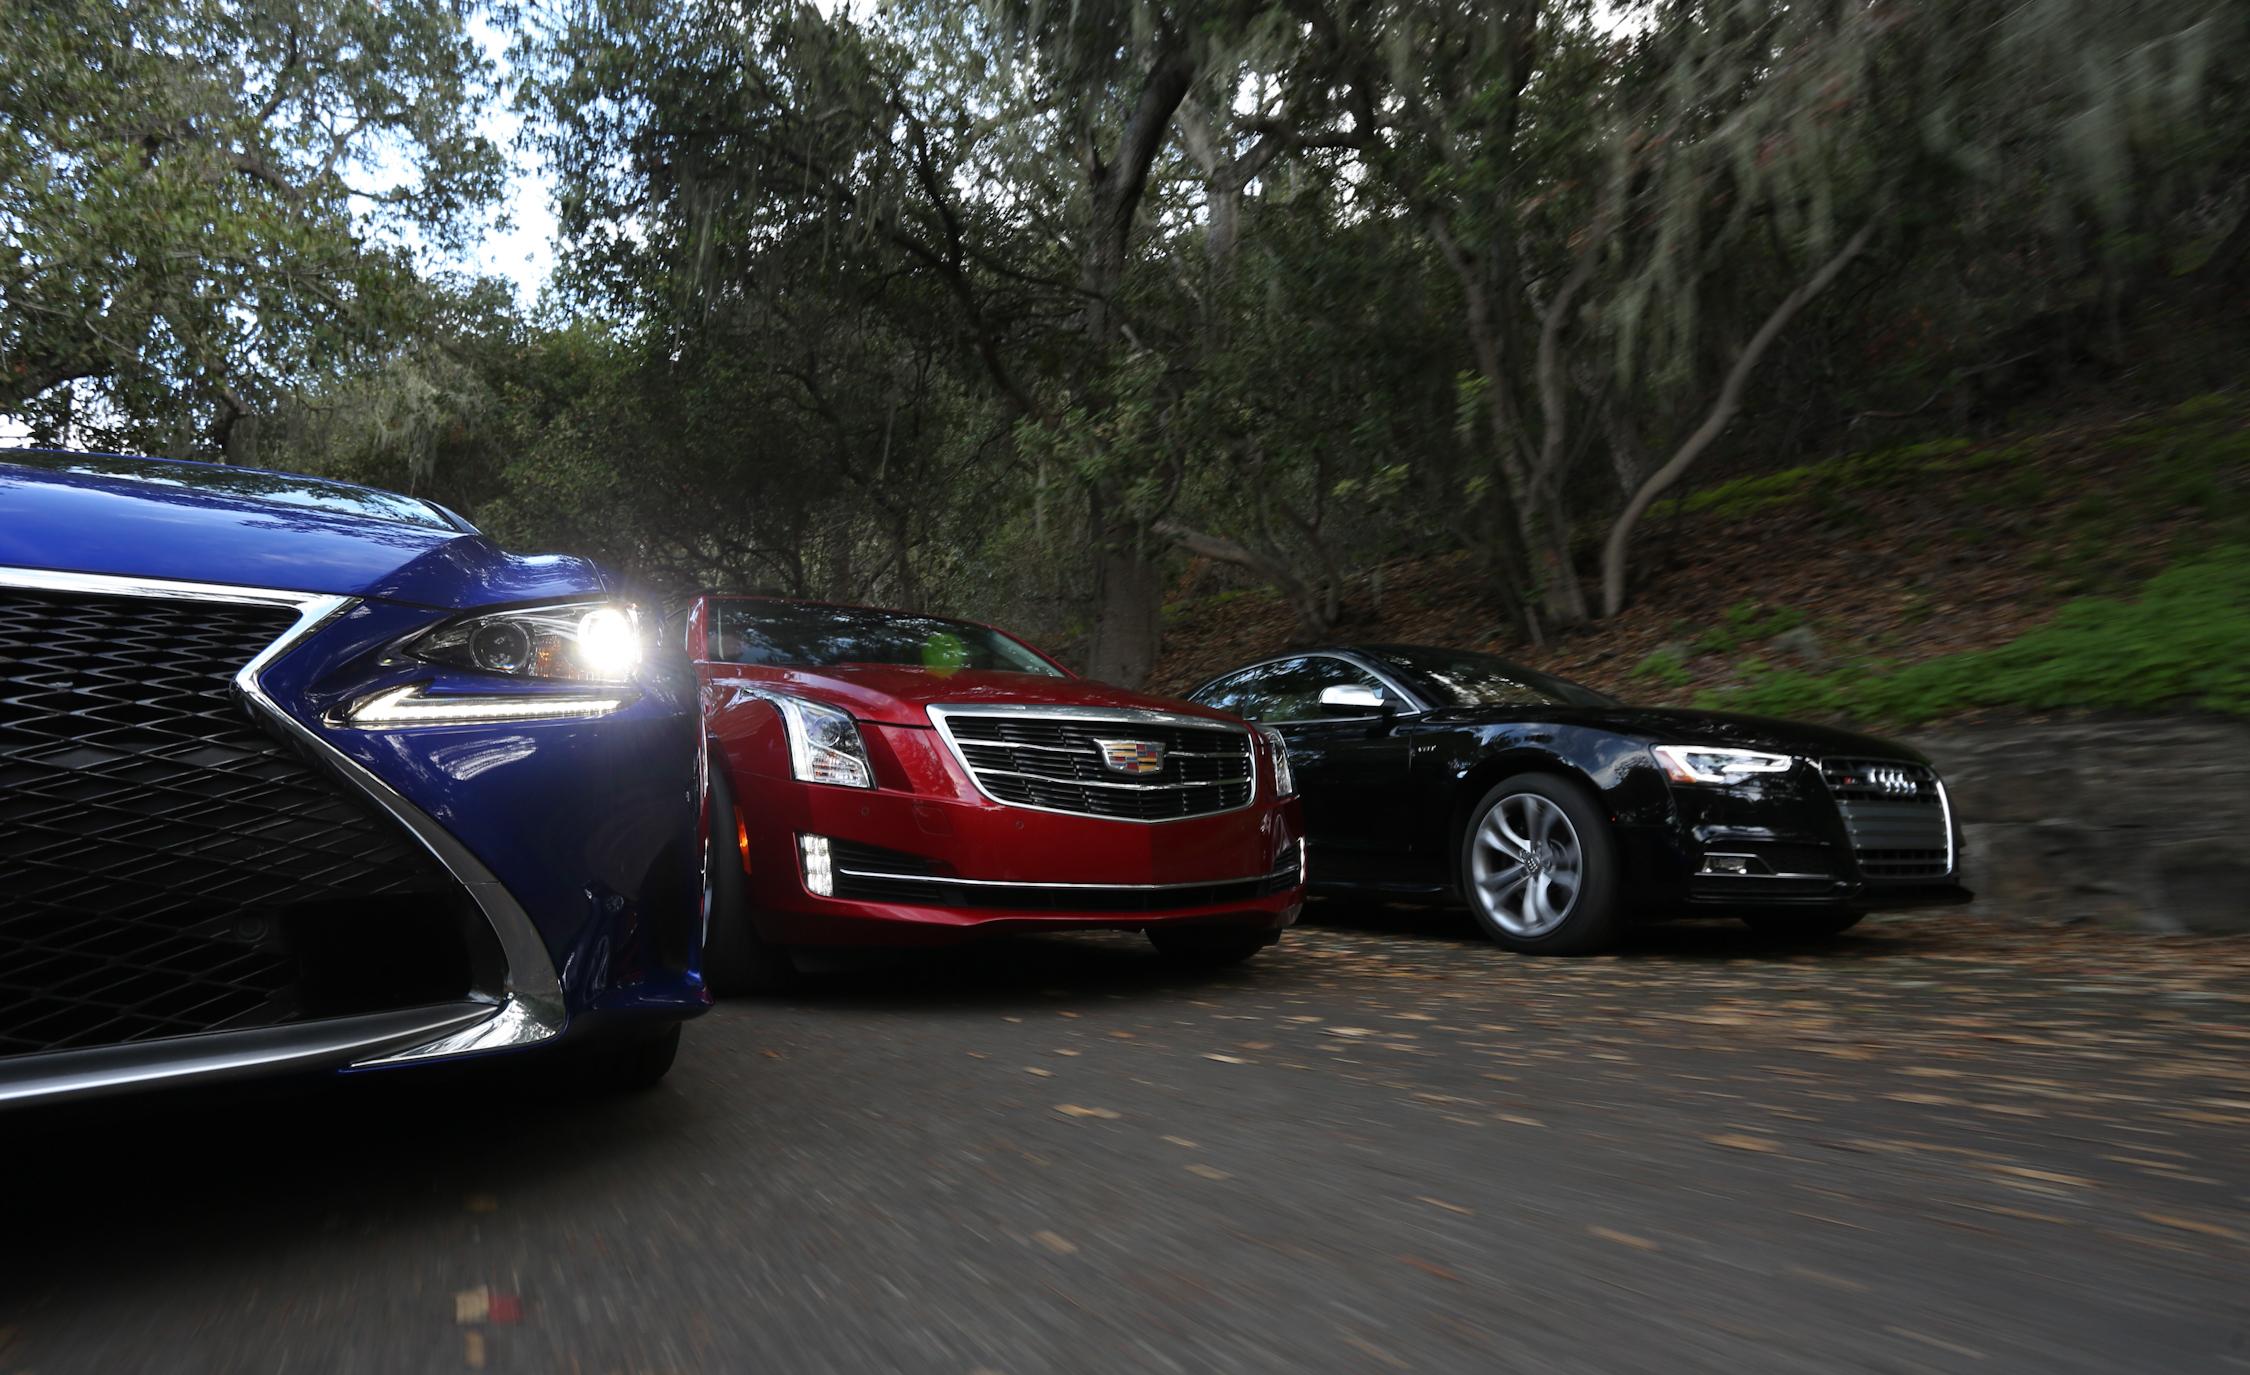 2015 Audi S5 vs 2015 Cadillac ATS Coupe 3.6 vs 2015 Lexus RC350 F